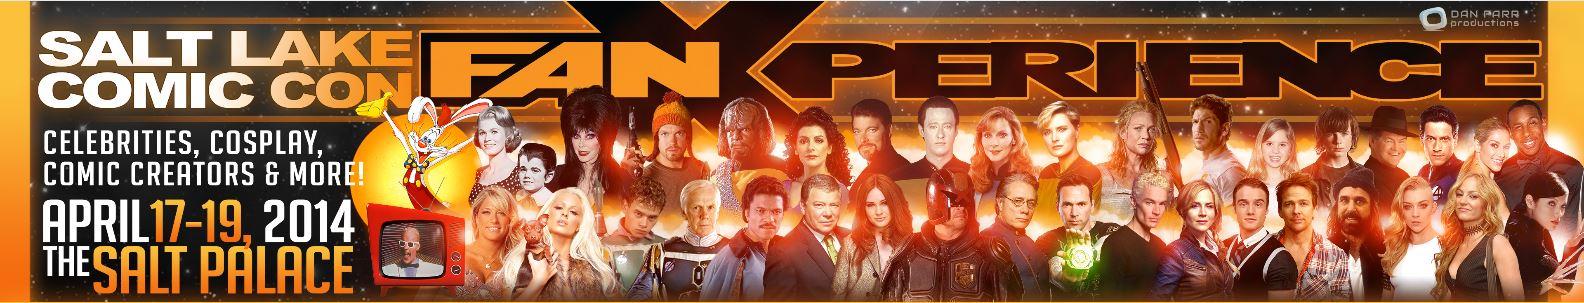 next week's Comic Con 2014: Fan Experience in Salt Lake City, Utah